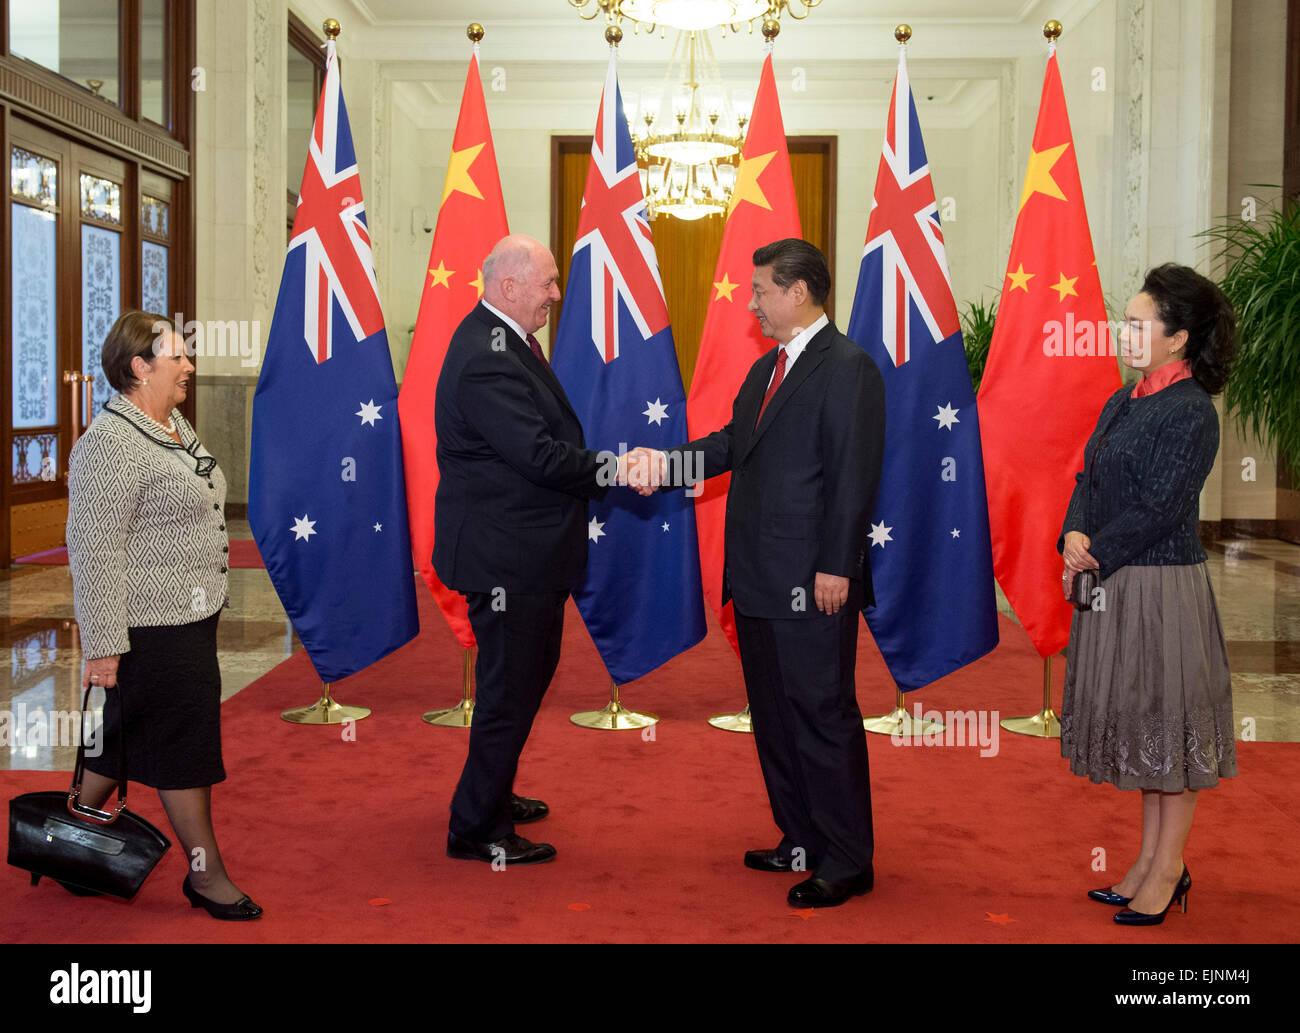 Beijing, China. 30th Mar, 2015. Chinese President Xi Jinping (2nd R) and his wife Peng Liyuan (1st R) greet Australian - Stock Image